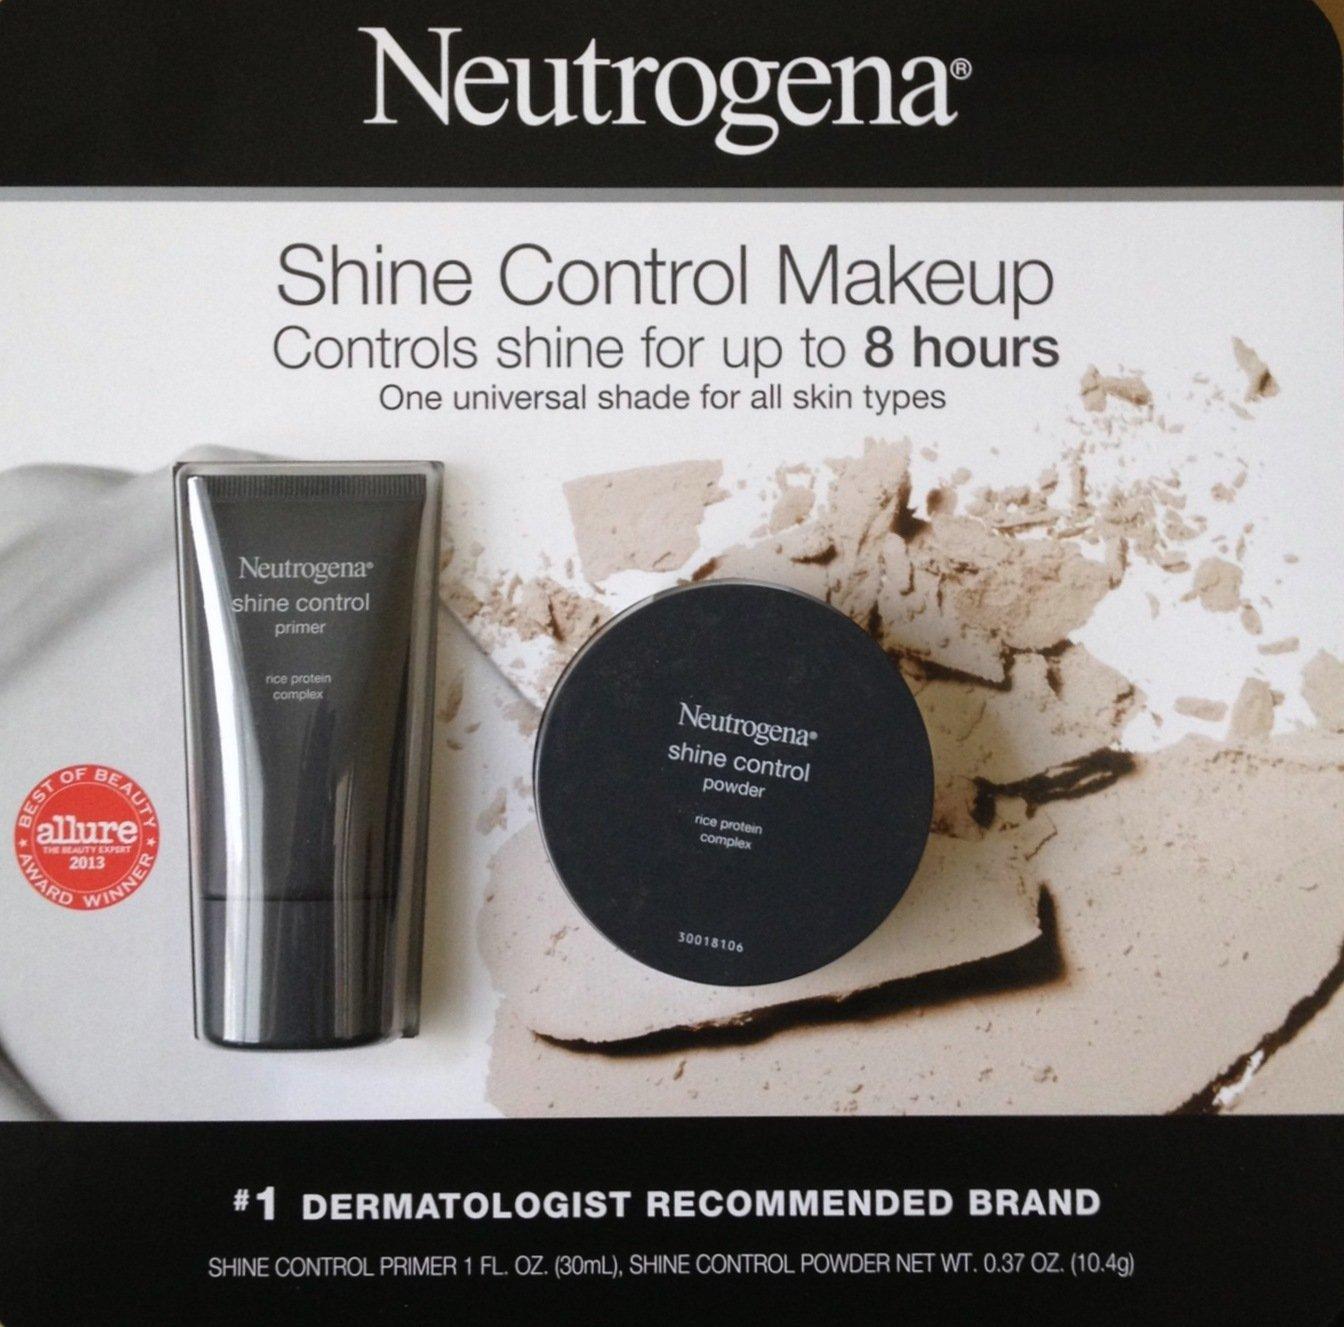 Neutrogena Shine Control Makeup package (Powder + Primer)